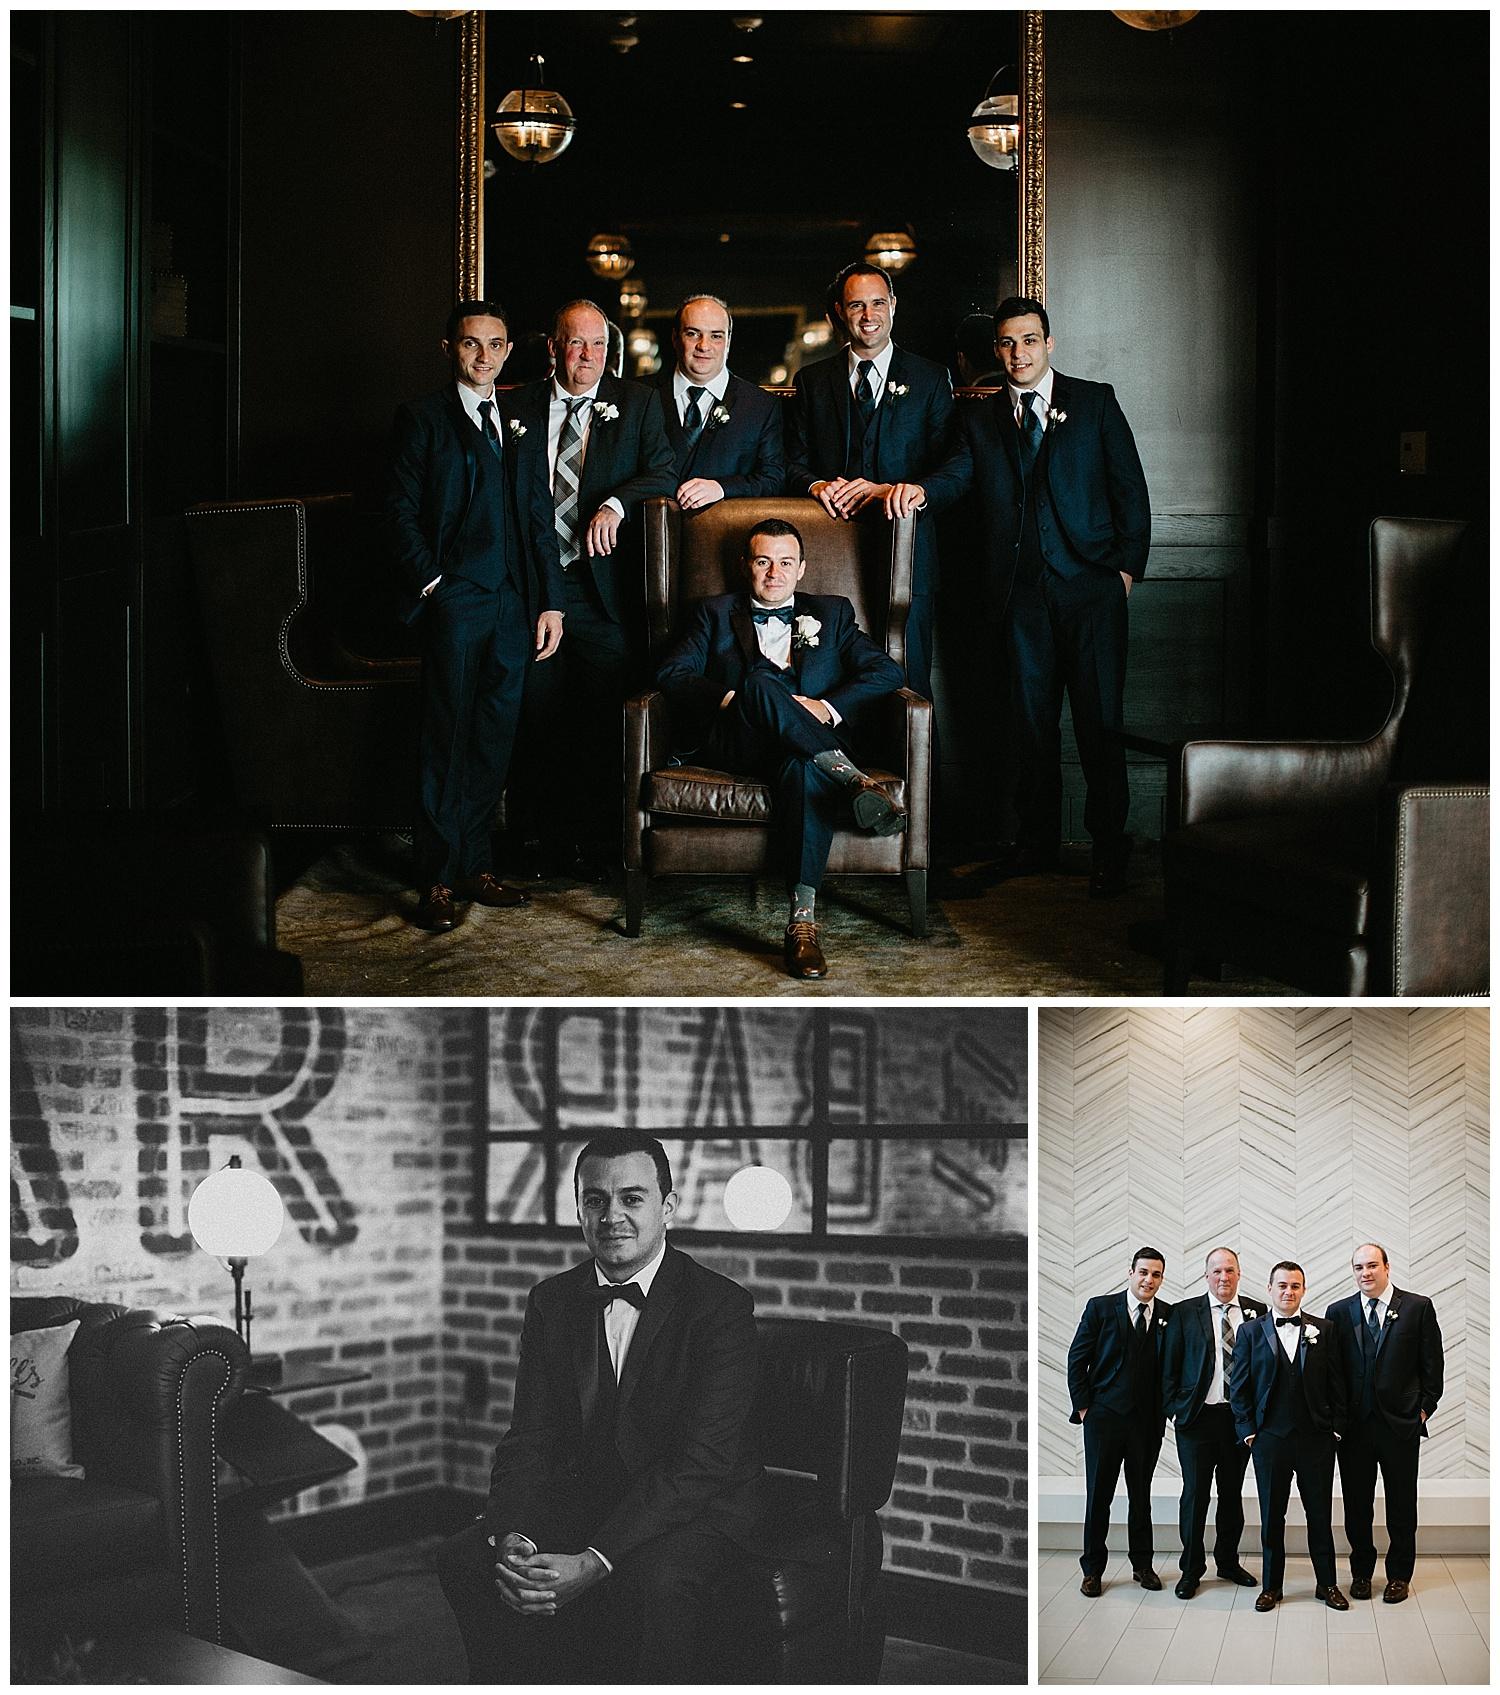 New-Jersey-wedding-photographer-at-Stone-House-at-stirling-ridge-Warren-NJ_0048.jpg